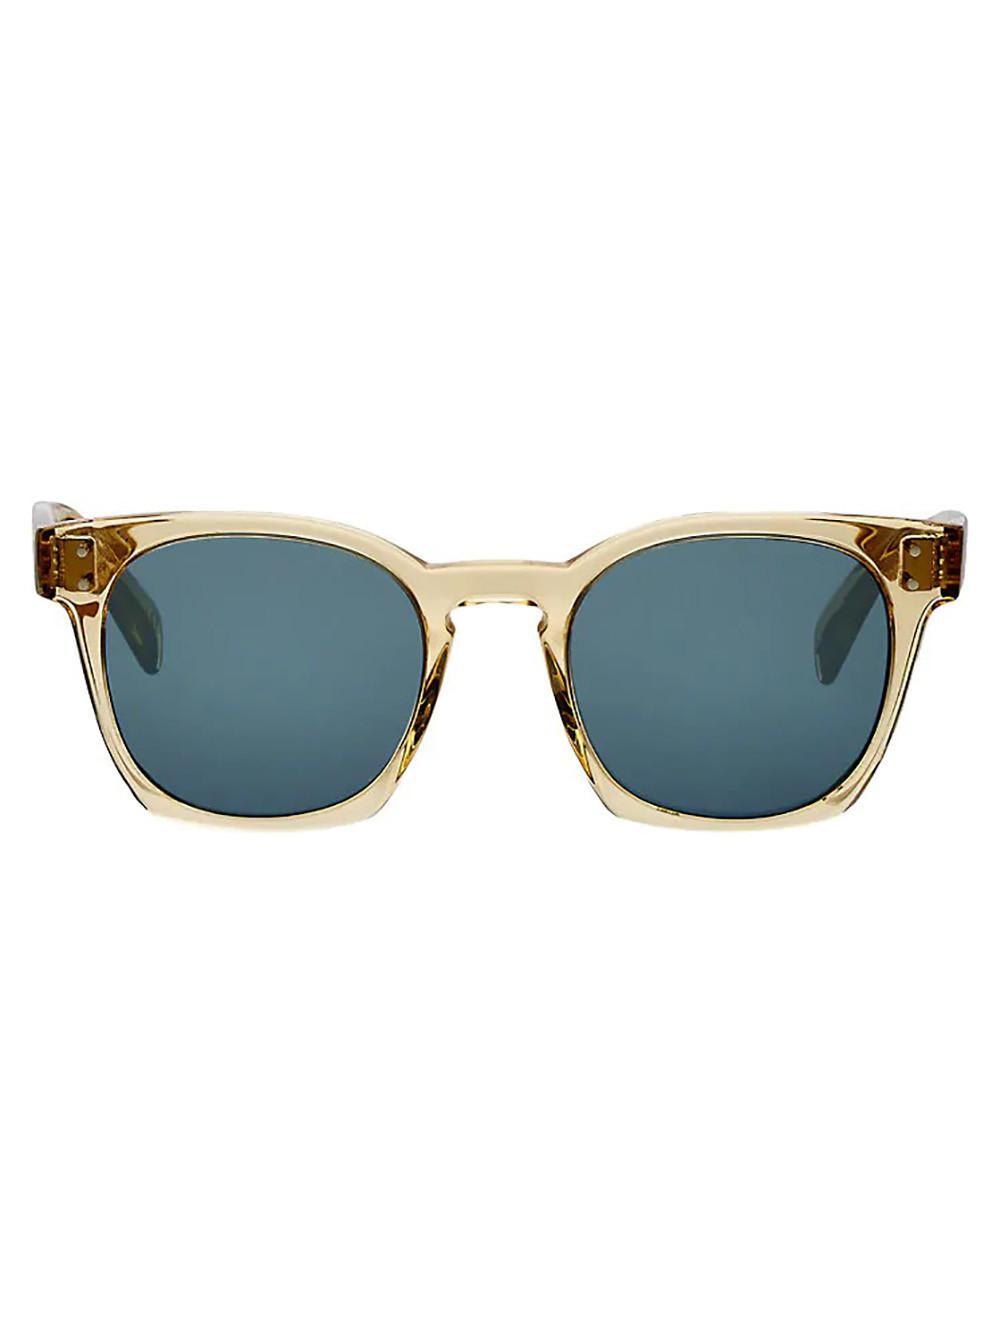 740b9eb3c3 Oliver Peoples Byredo Sunglasses for Men - Lyst